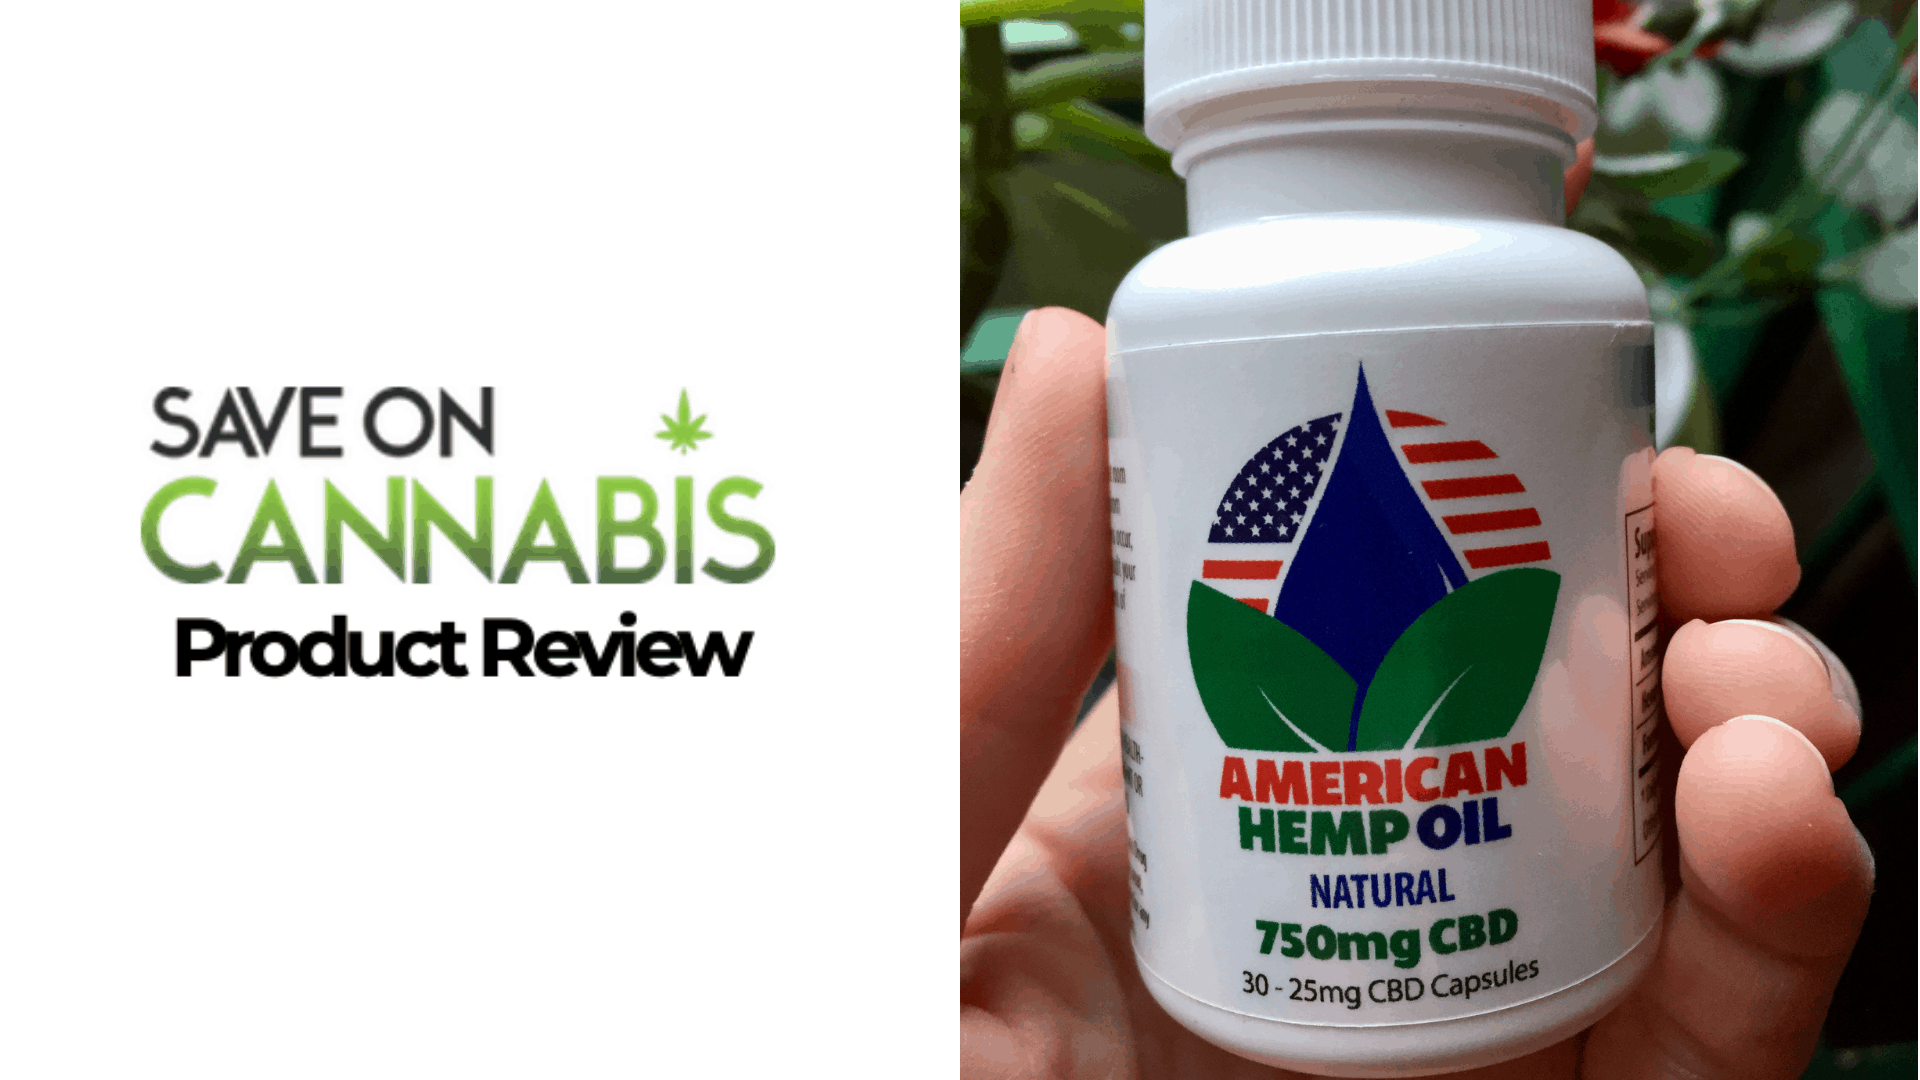 american hemp oil 750 mg cbd oil gel caps Save On Cannabis Website